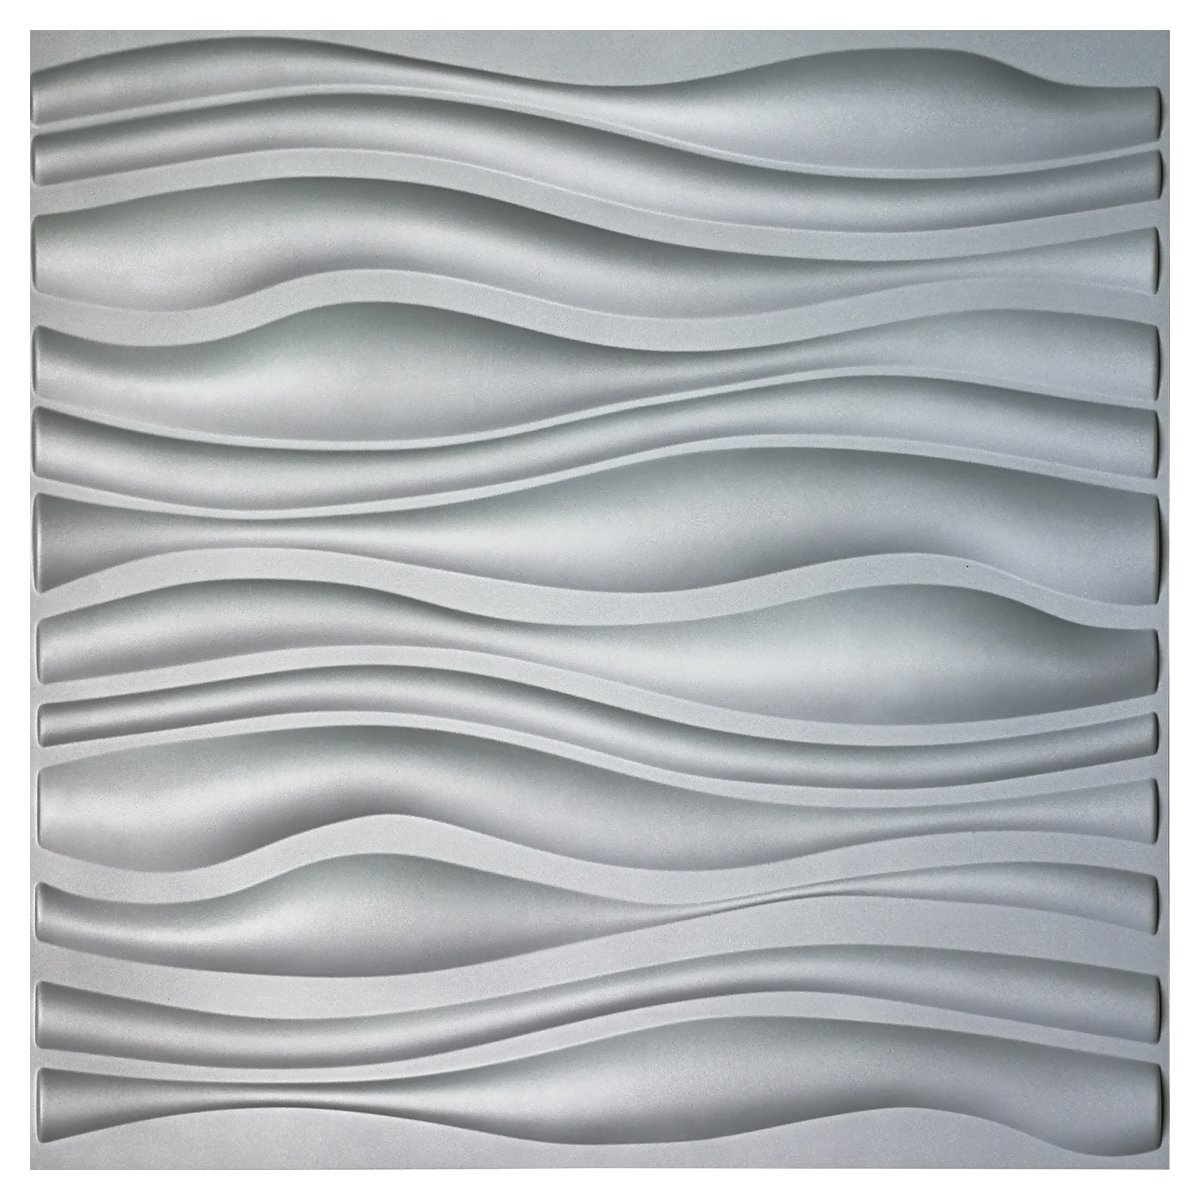 Art3d PVC Wave Board Textured 3D Wall Panels, Grey, 19.7 x 19.7 (12 Pack)